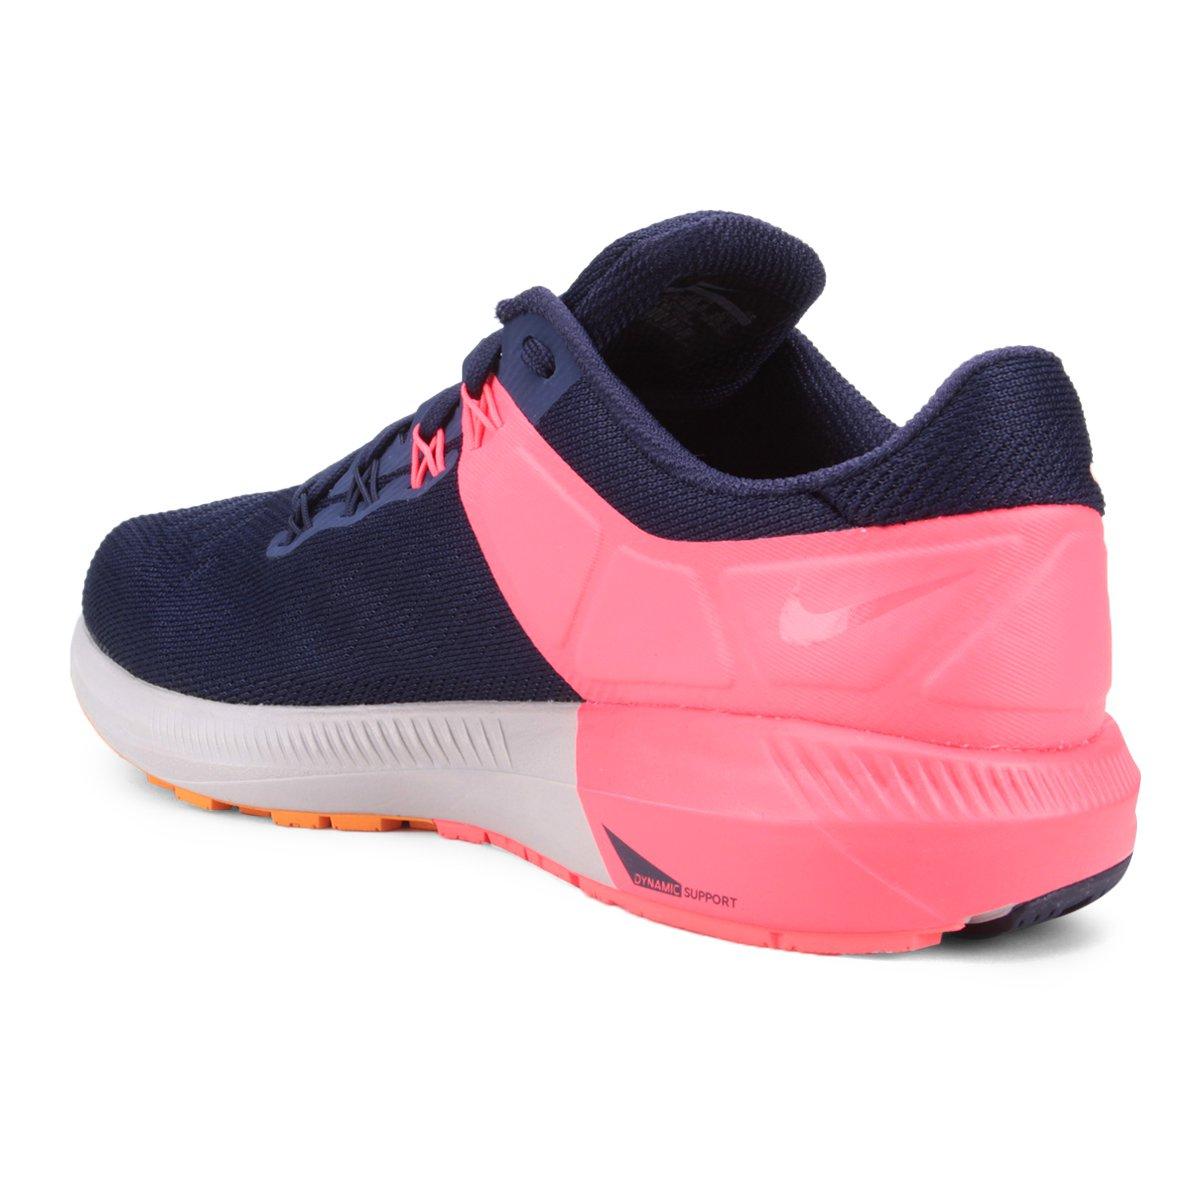 Tênis Nike Air Zoom Structure 22 Masculino - Azul e Laranja - Compre ... 66c198be486f5